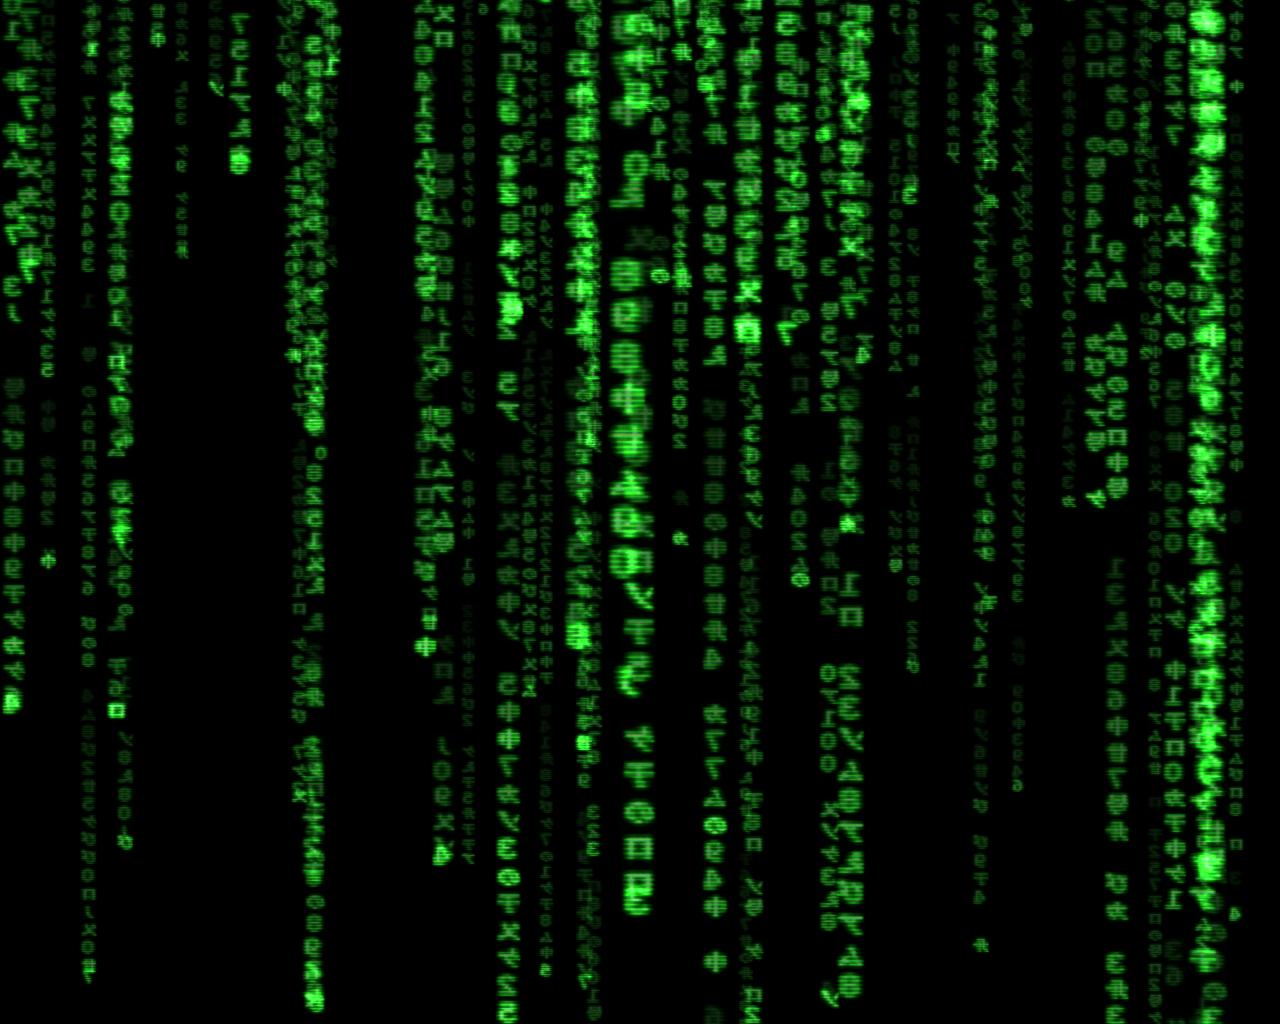 File:The Matrix glmatrix 3 png - Wikimedia Commons